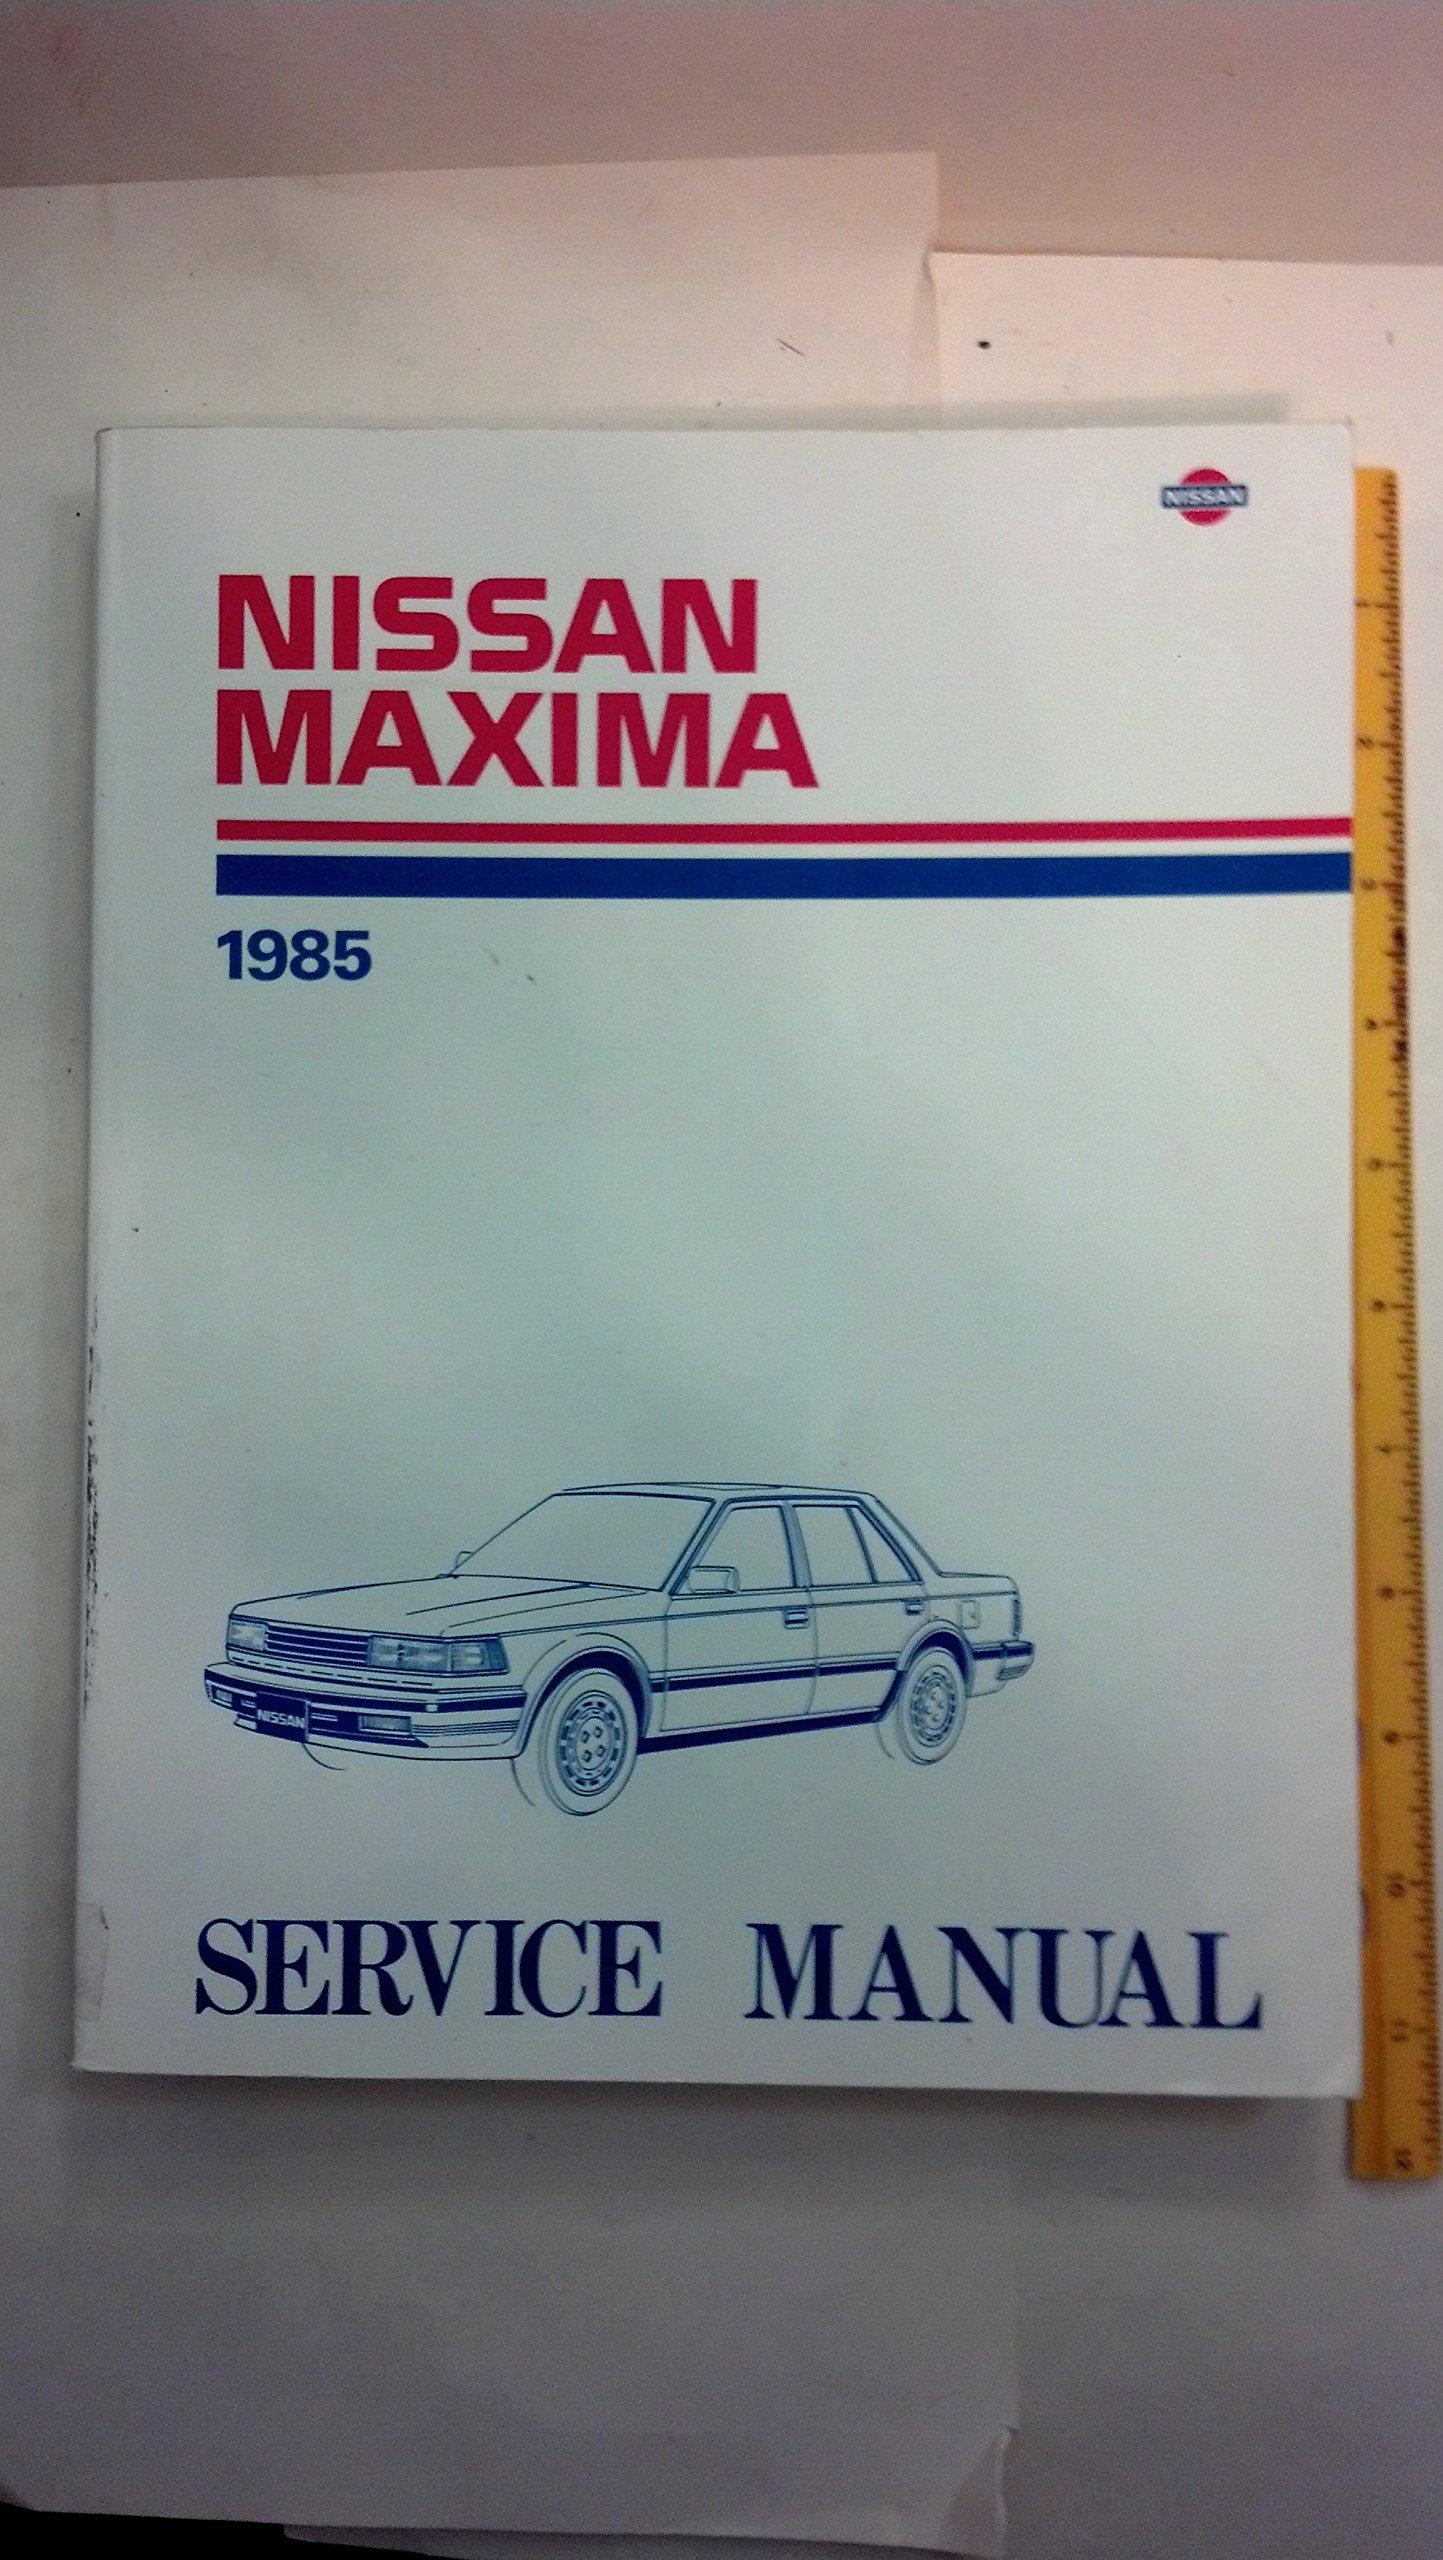 1986 Nissan Maxima Service Manual: Nissan Motor Company: Amazon.com: Books